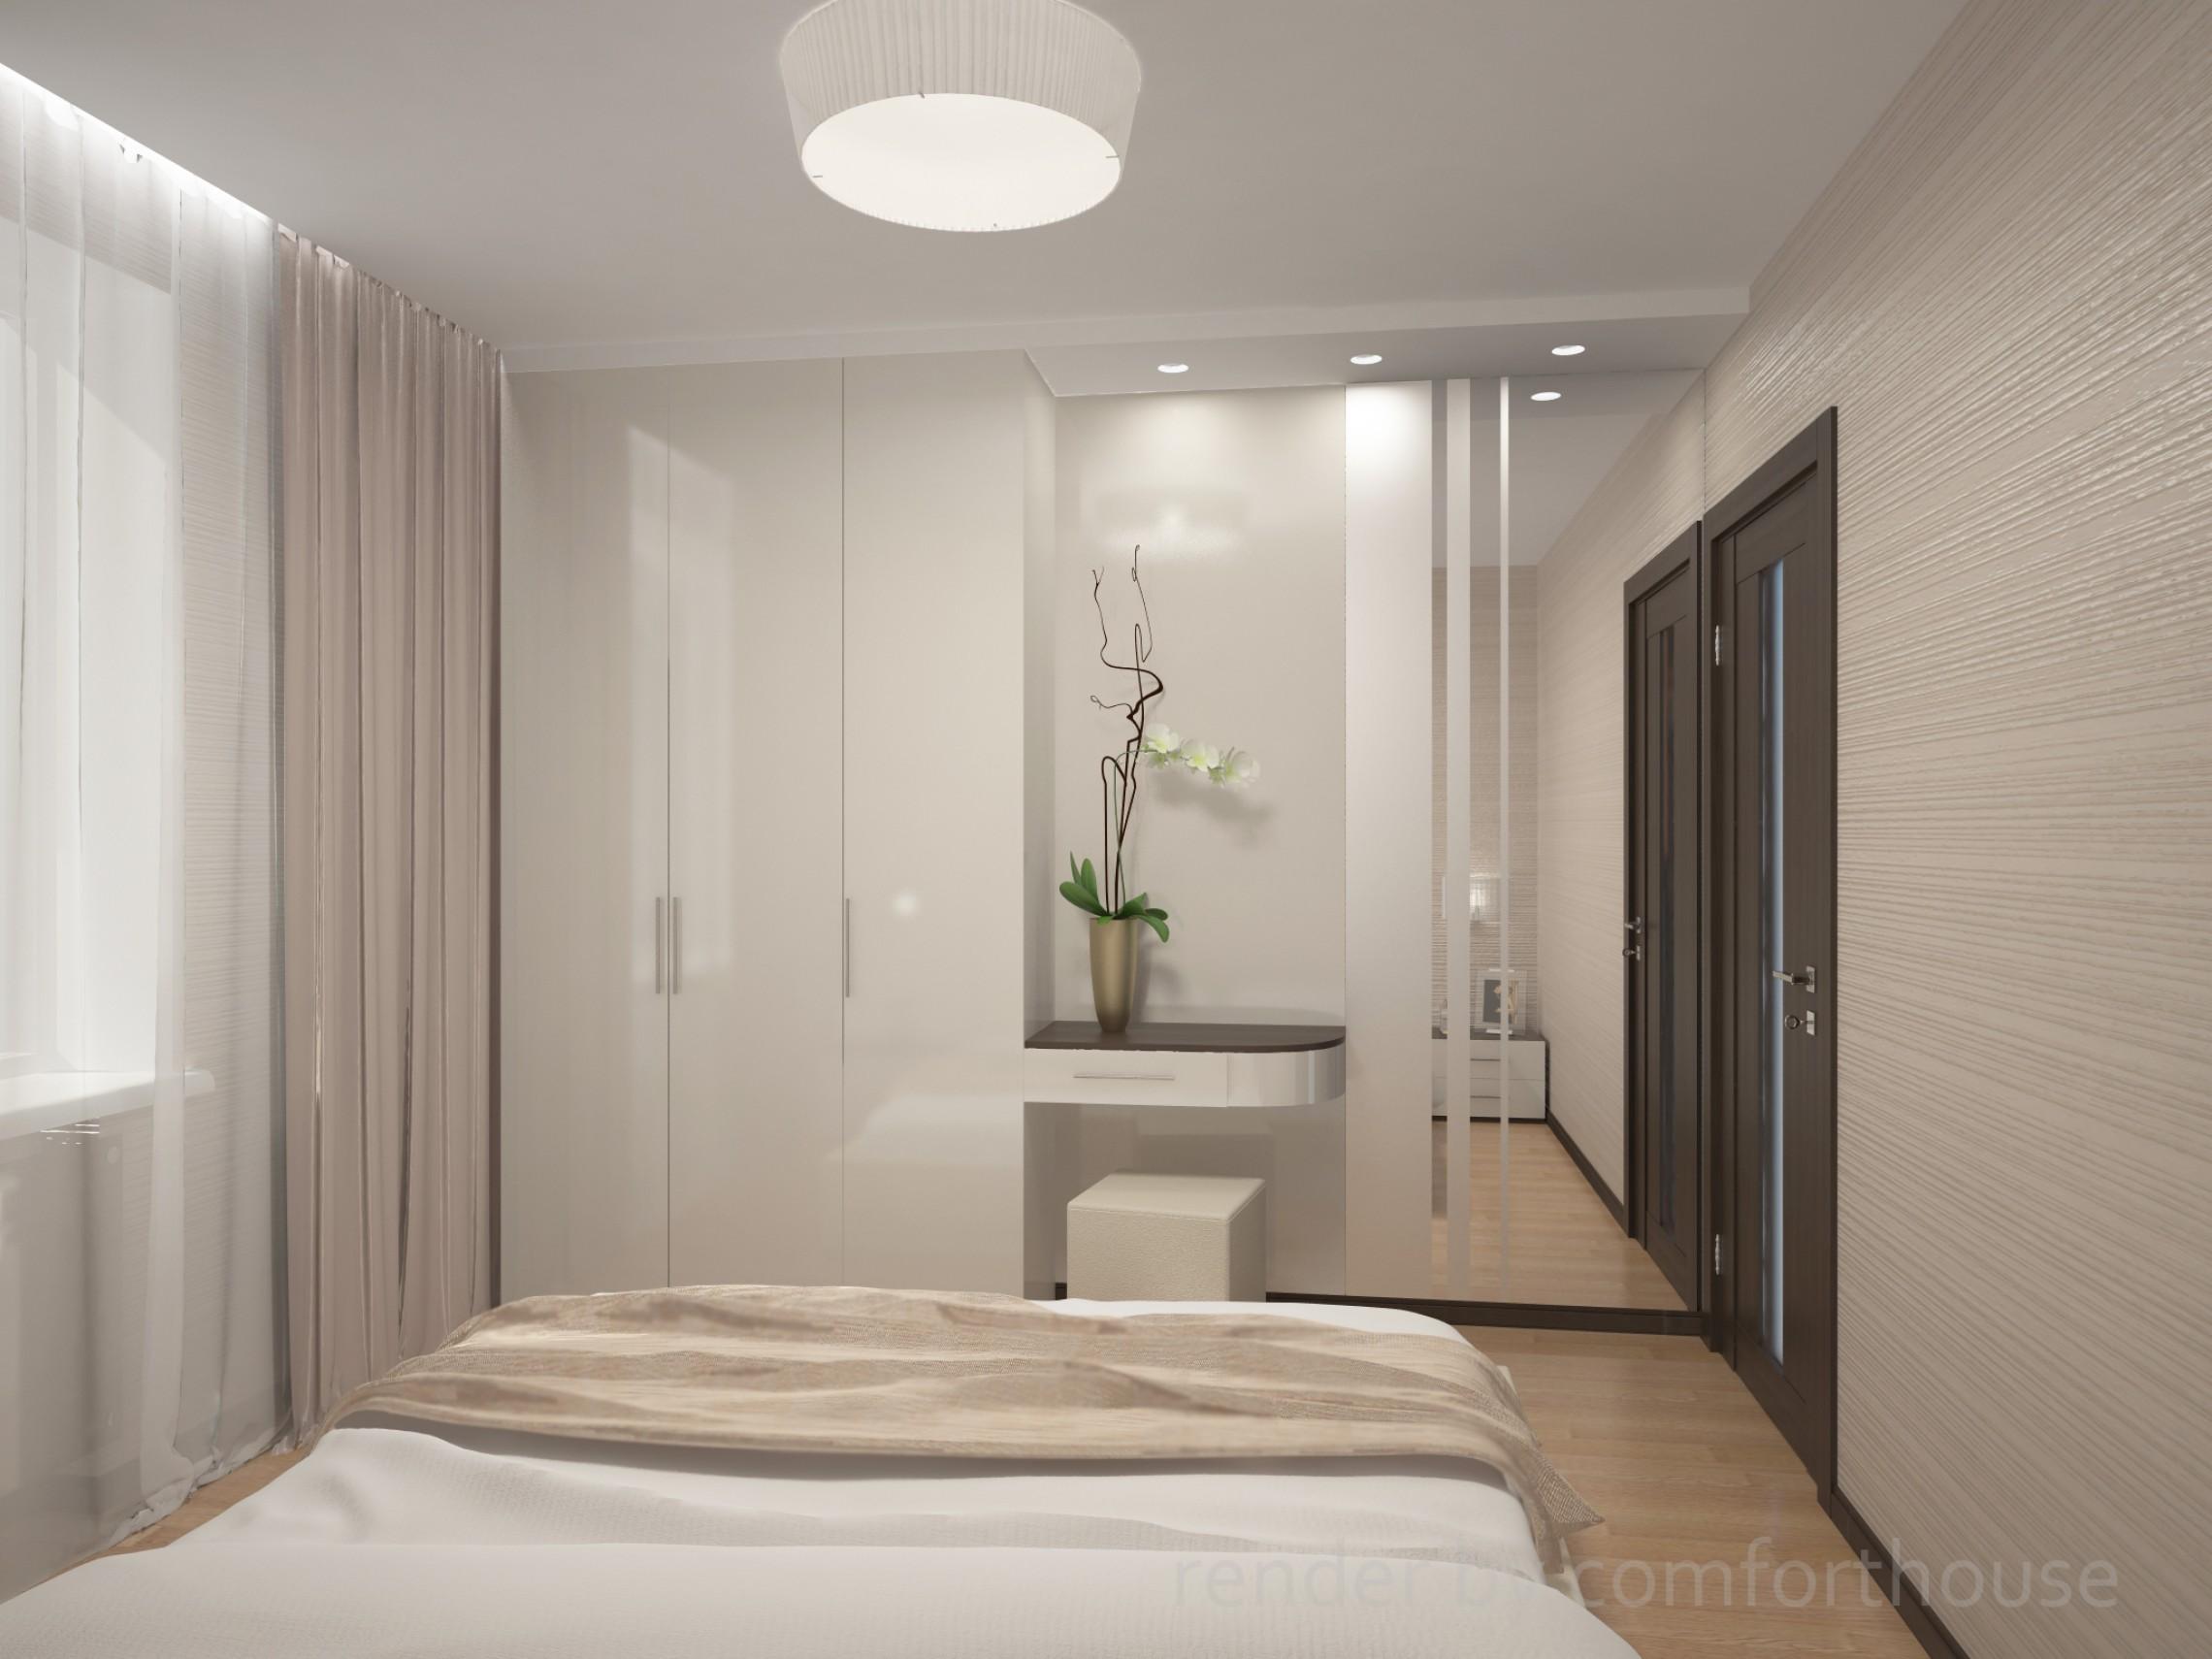 Interior in one color bedroom